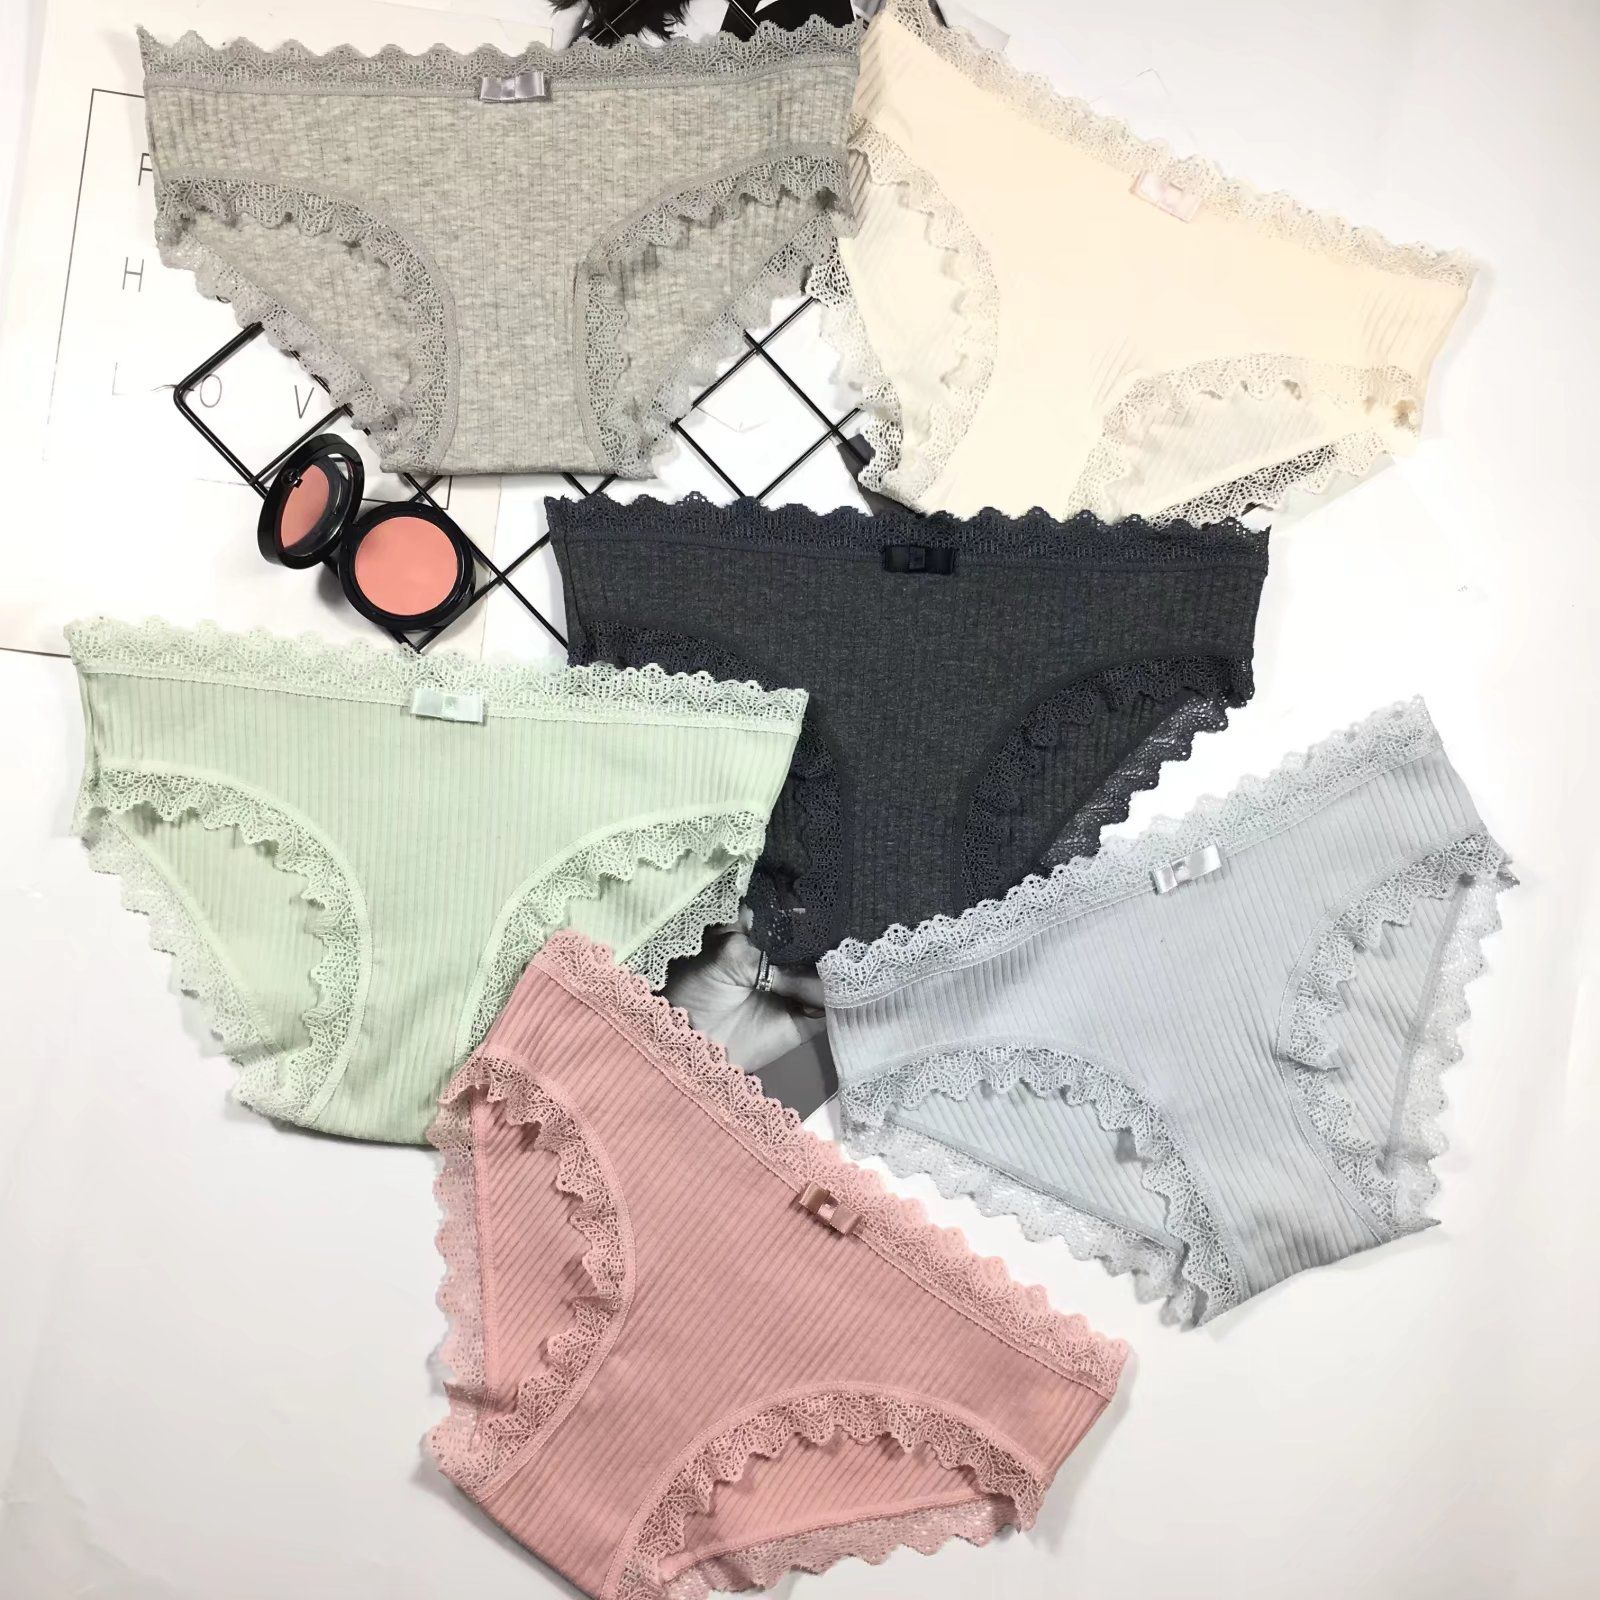 2018 New Fashion Underwear Sexy Lace Pure Cotton Women's Panties Hot Low Waist Briefs Girls Lolita Style Panties